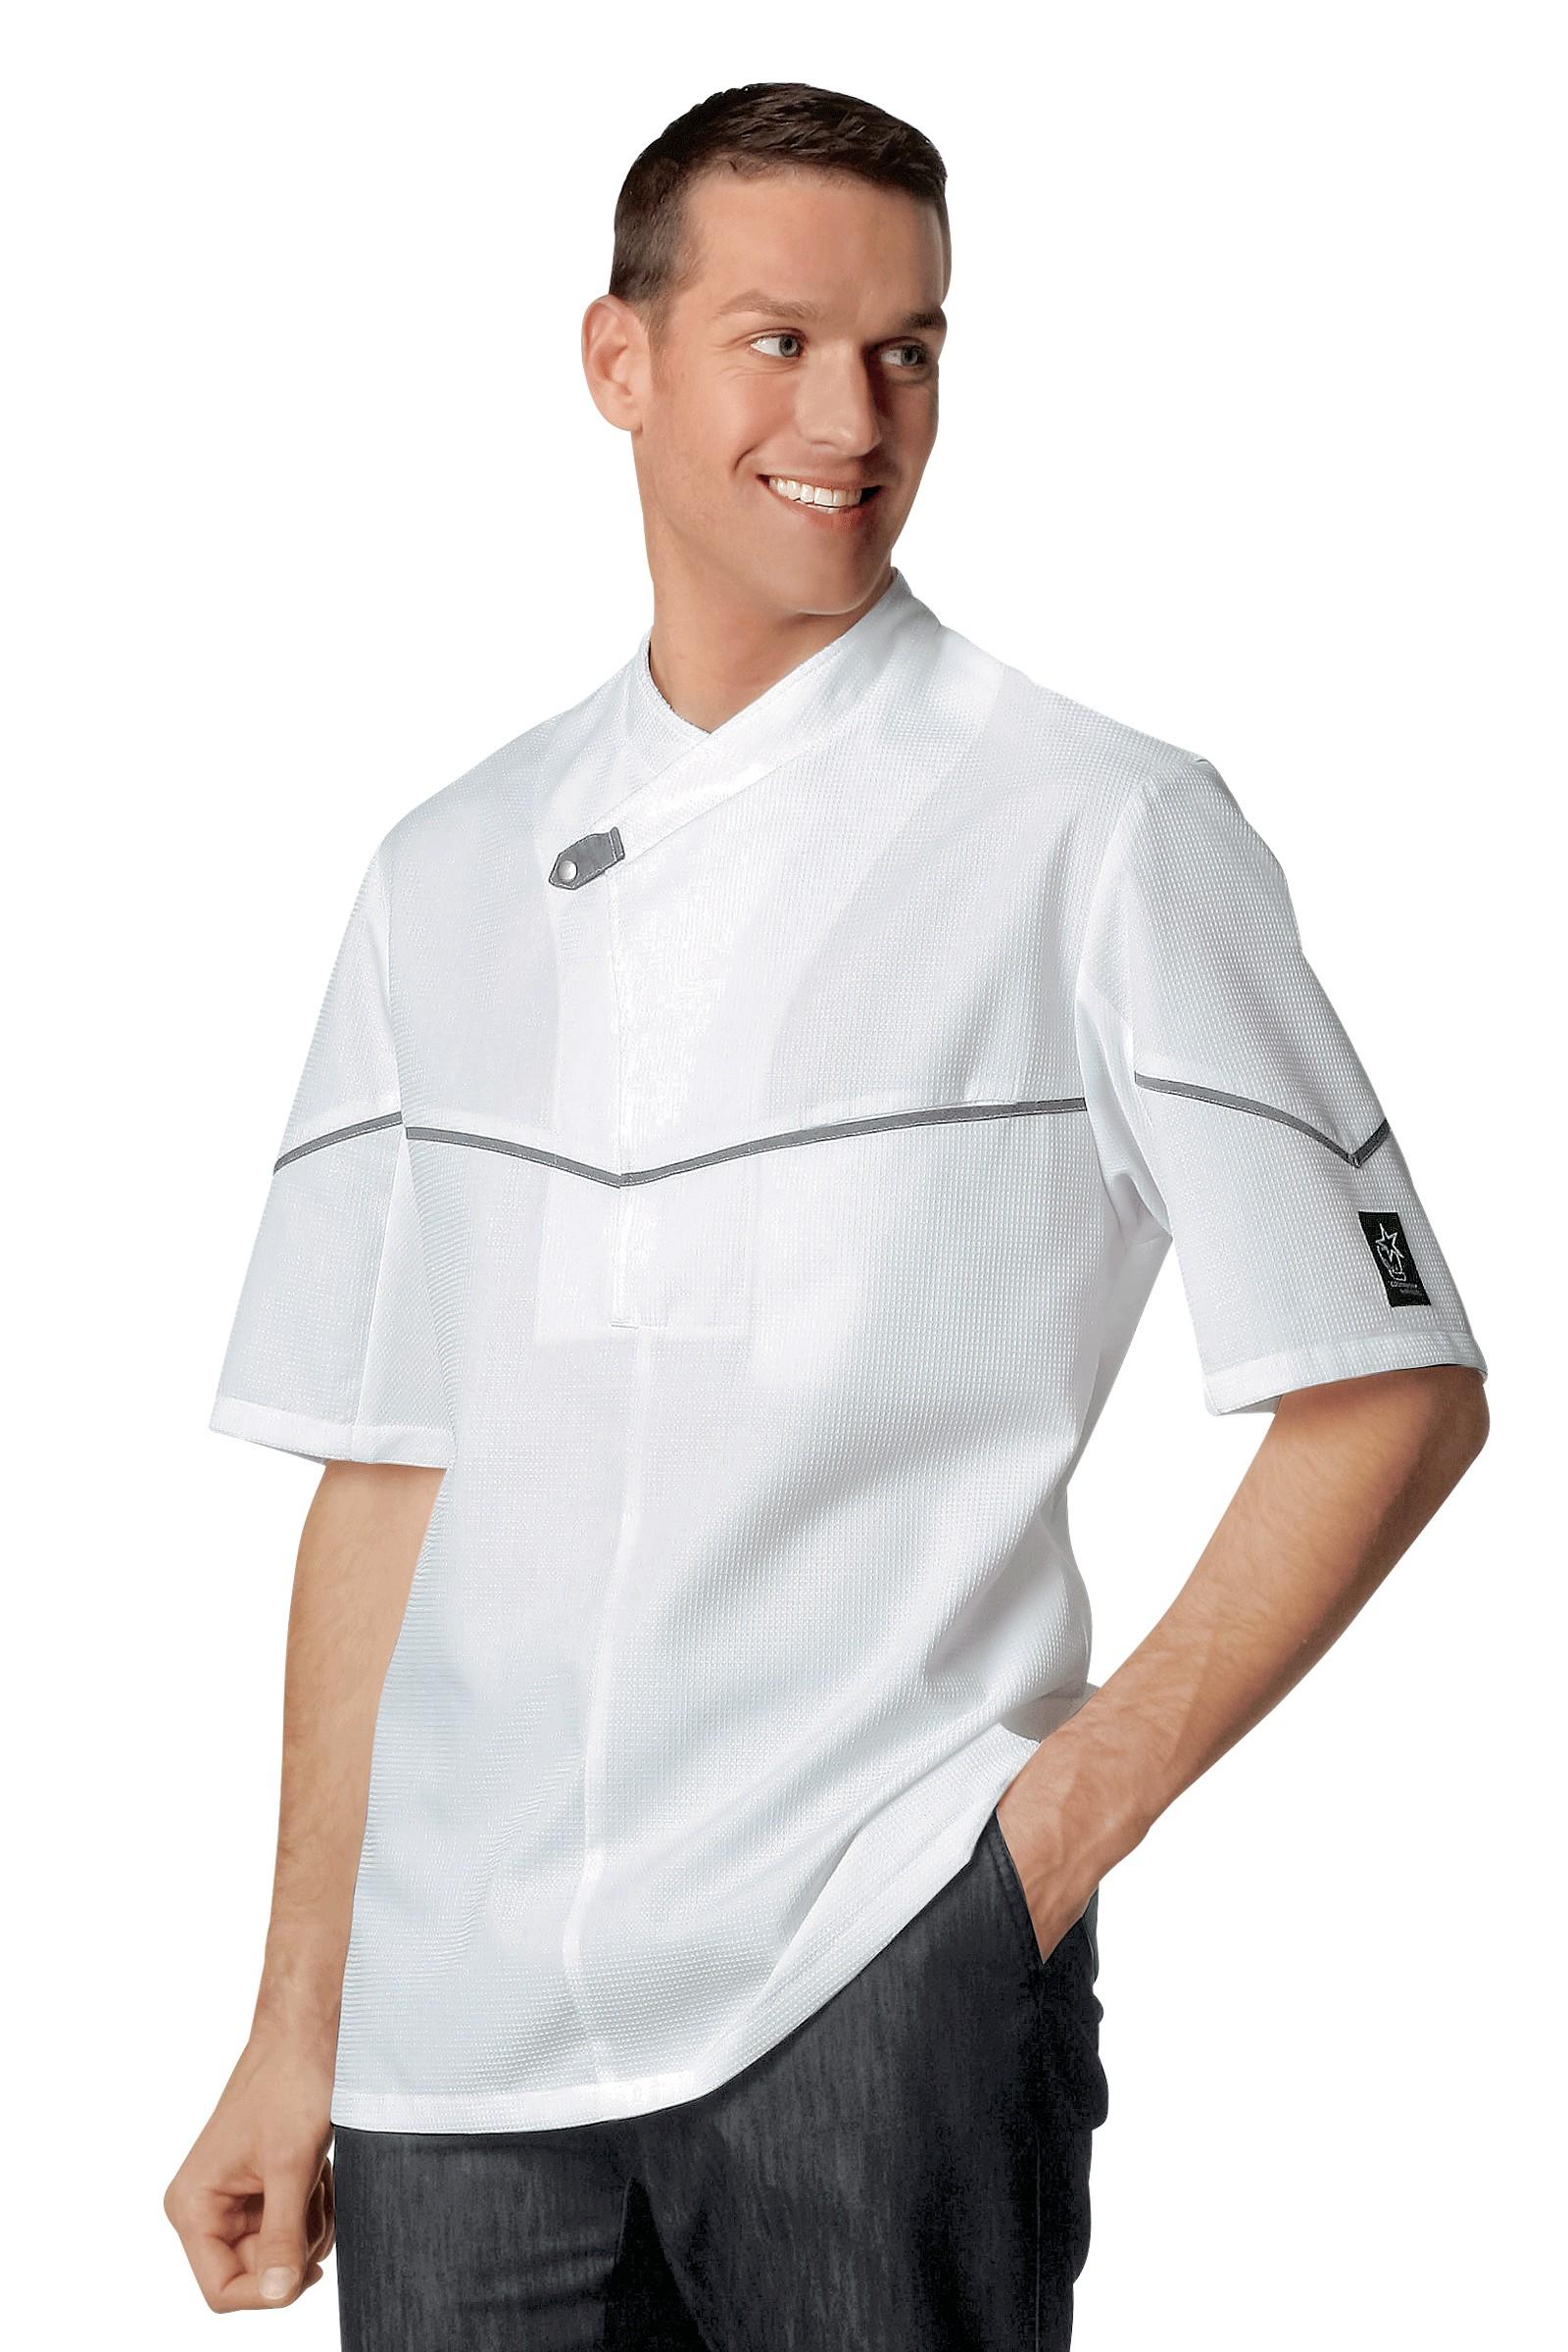 Chaquetillas de cocina texas blanco - Chaquetillas de cocina ...